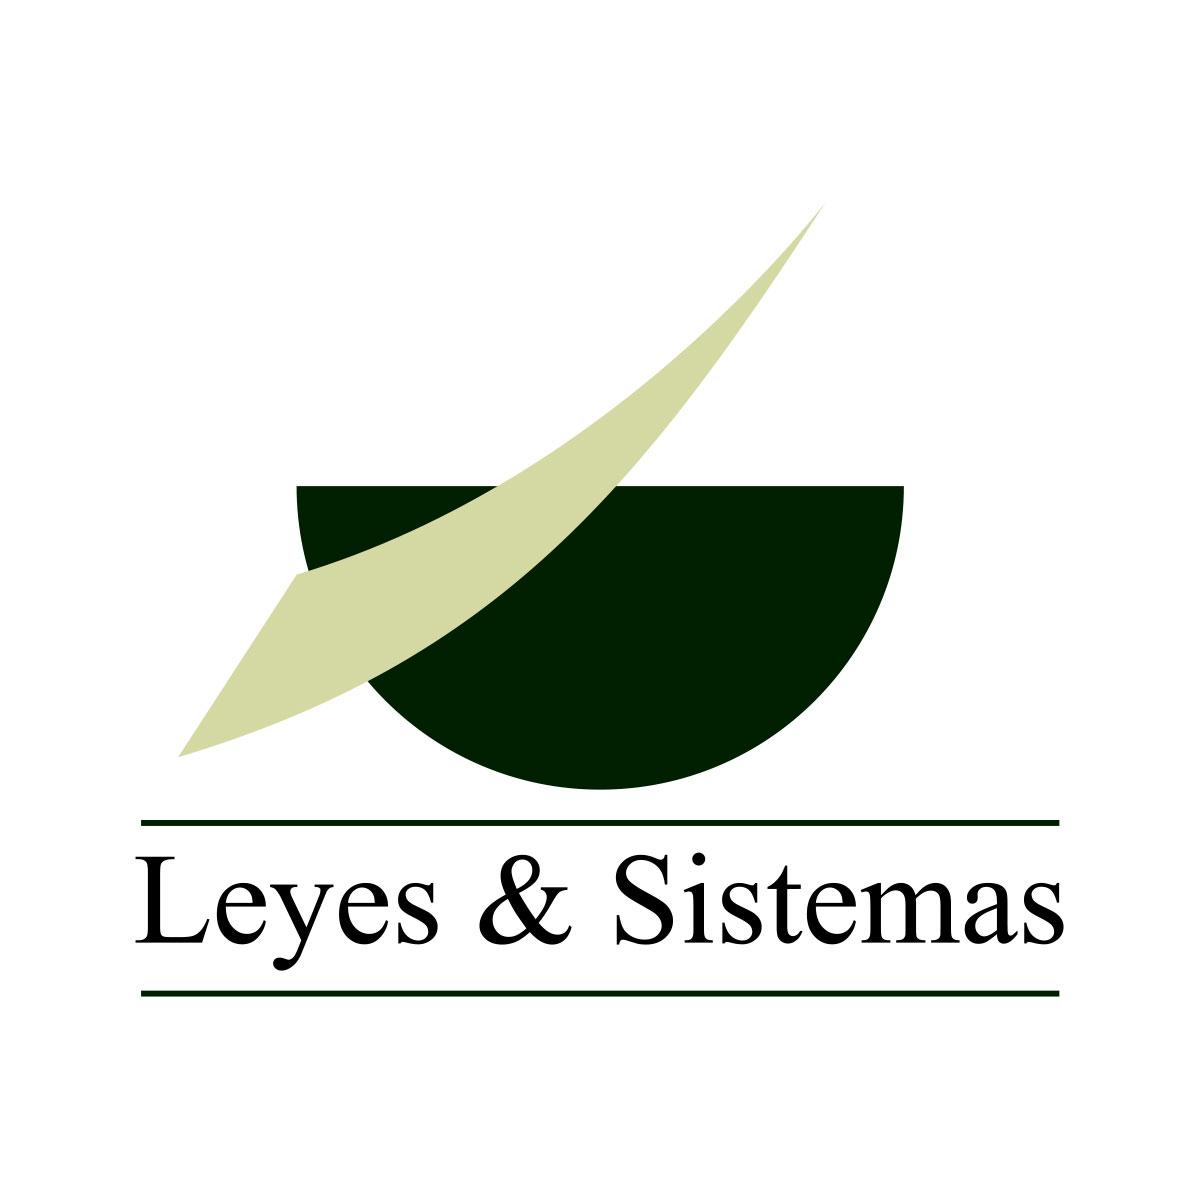 Logotipo Leyes & Sistemas